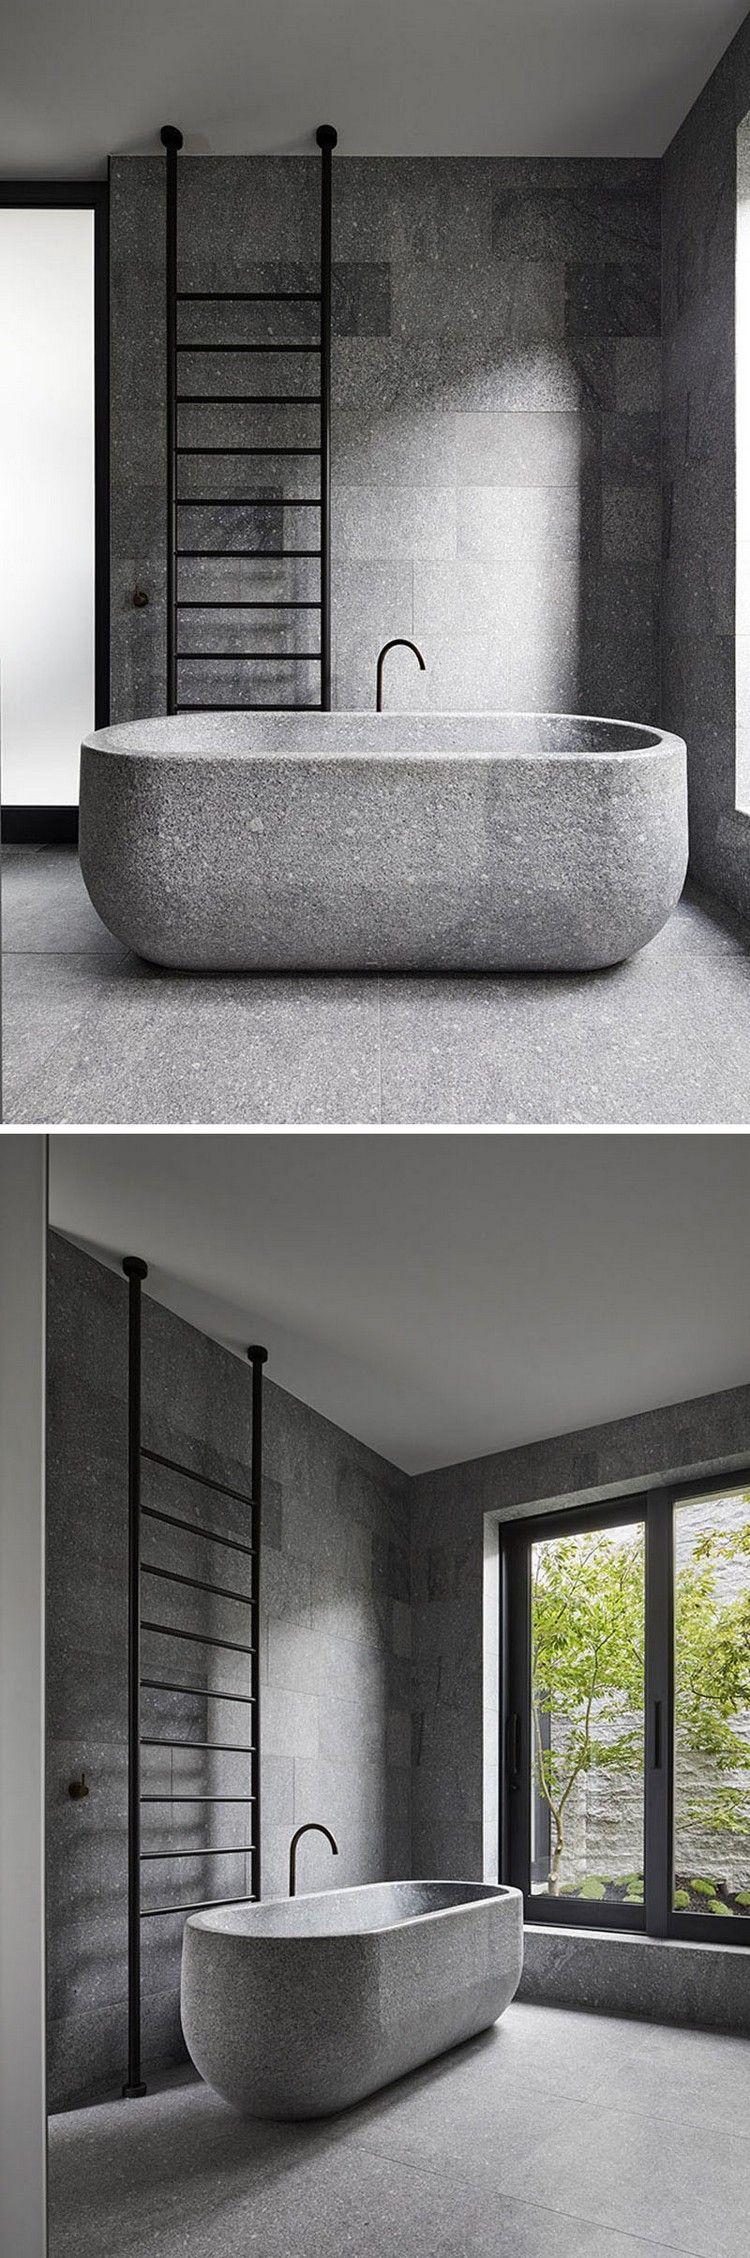 modernes badezimmer design granit fu boden w nde badewanne architektur architecture facade. Black Bedroom Furniture Sets. Home Design Ideas